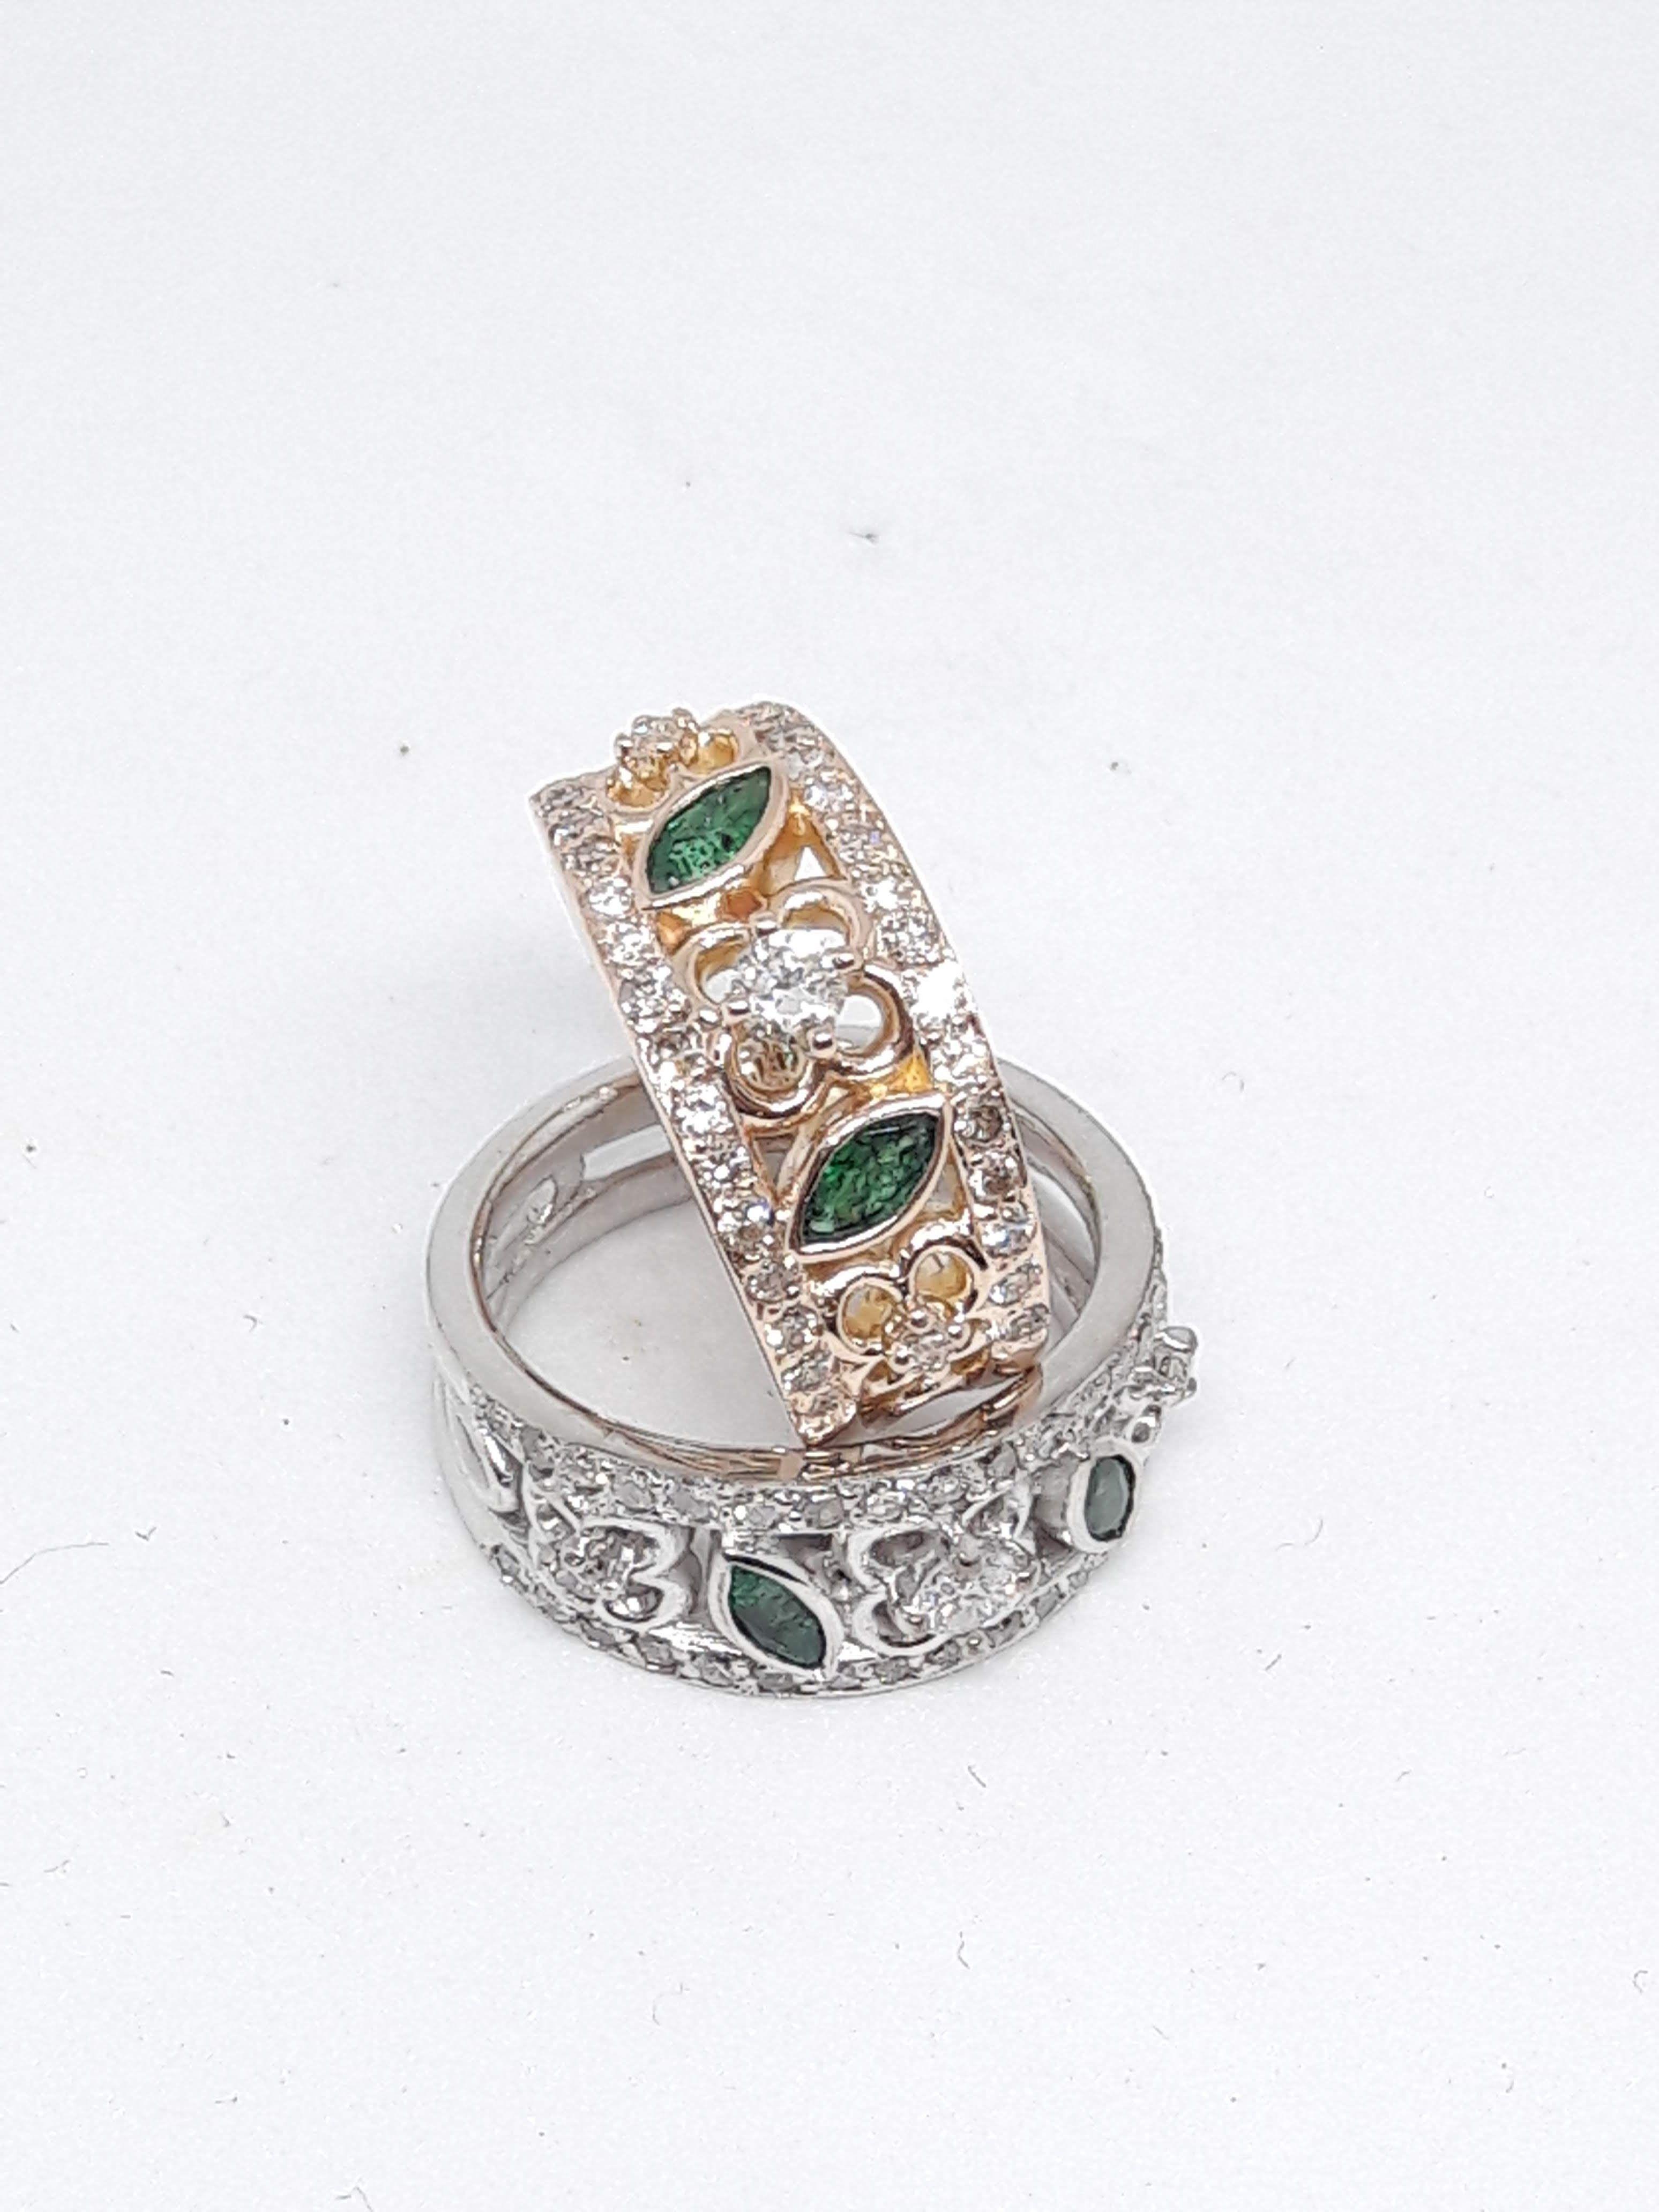 Flower design emerald and diamond rings wedding rings